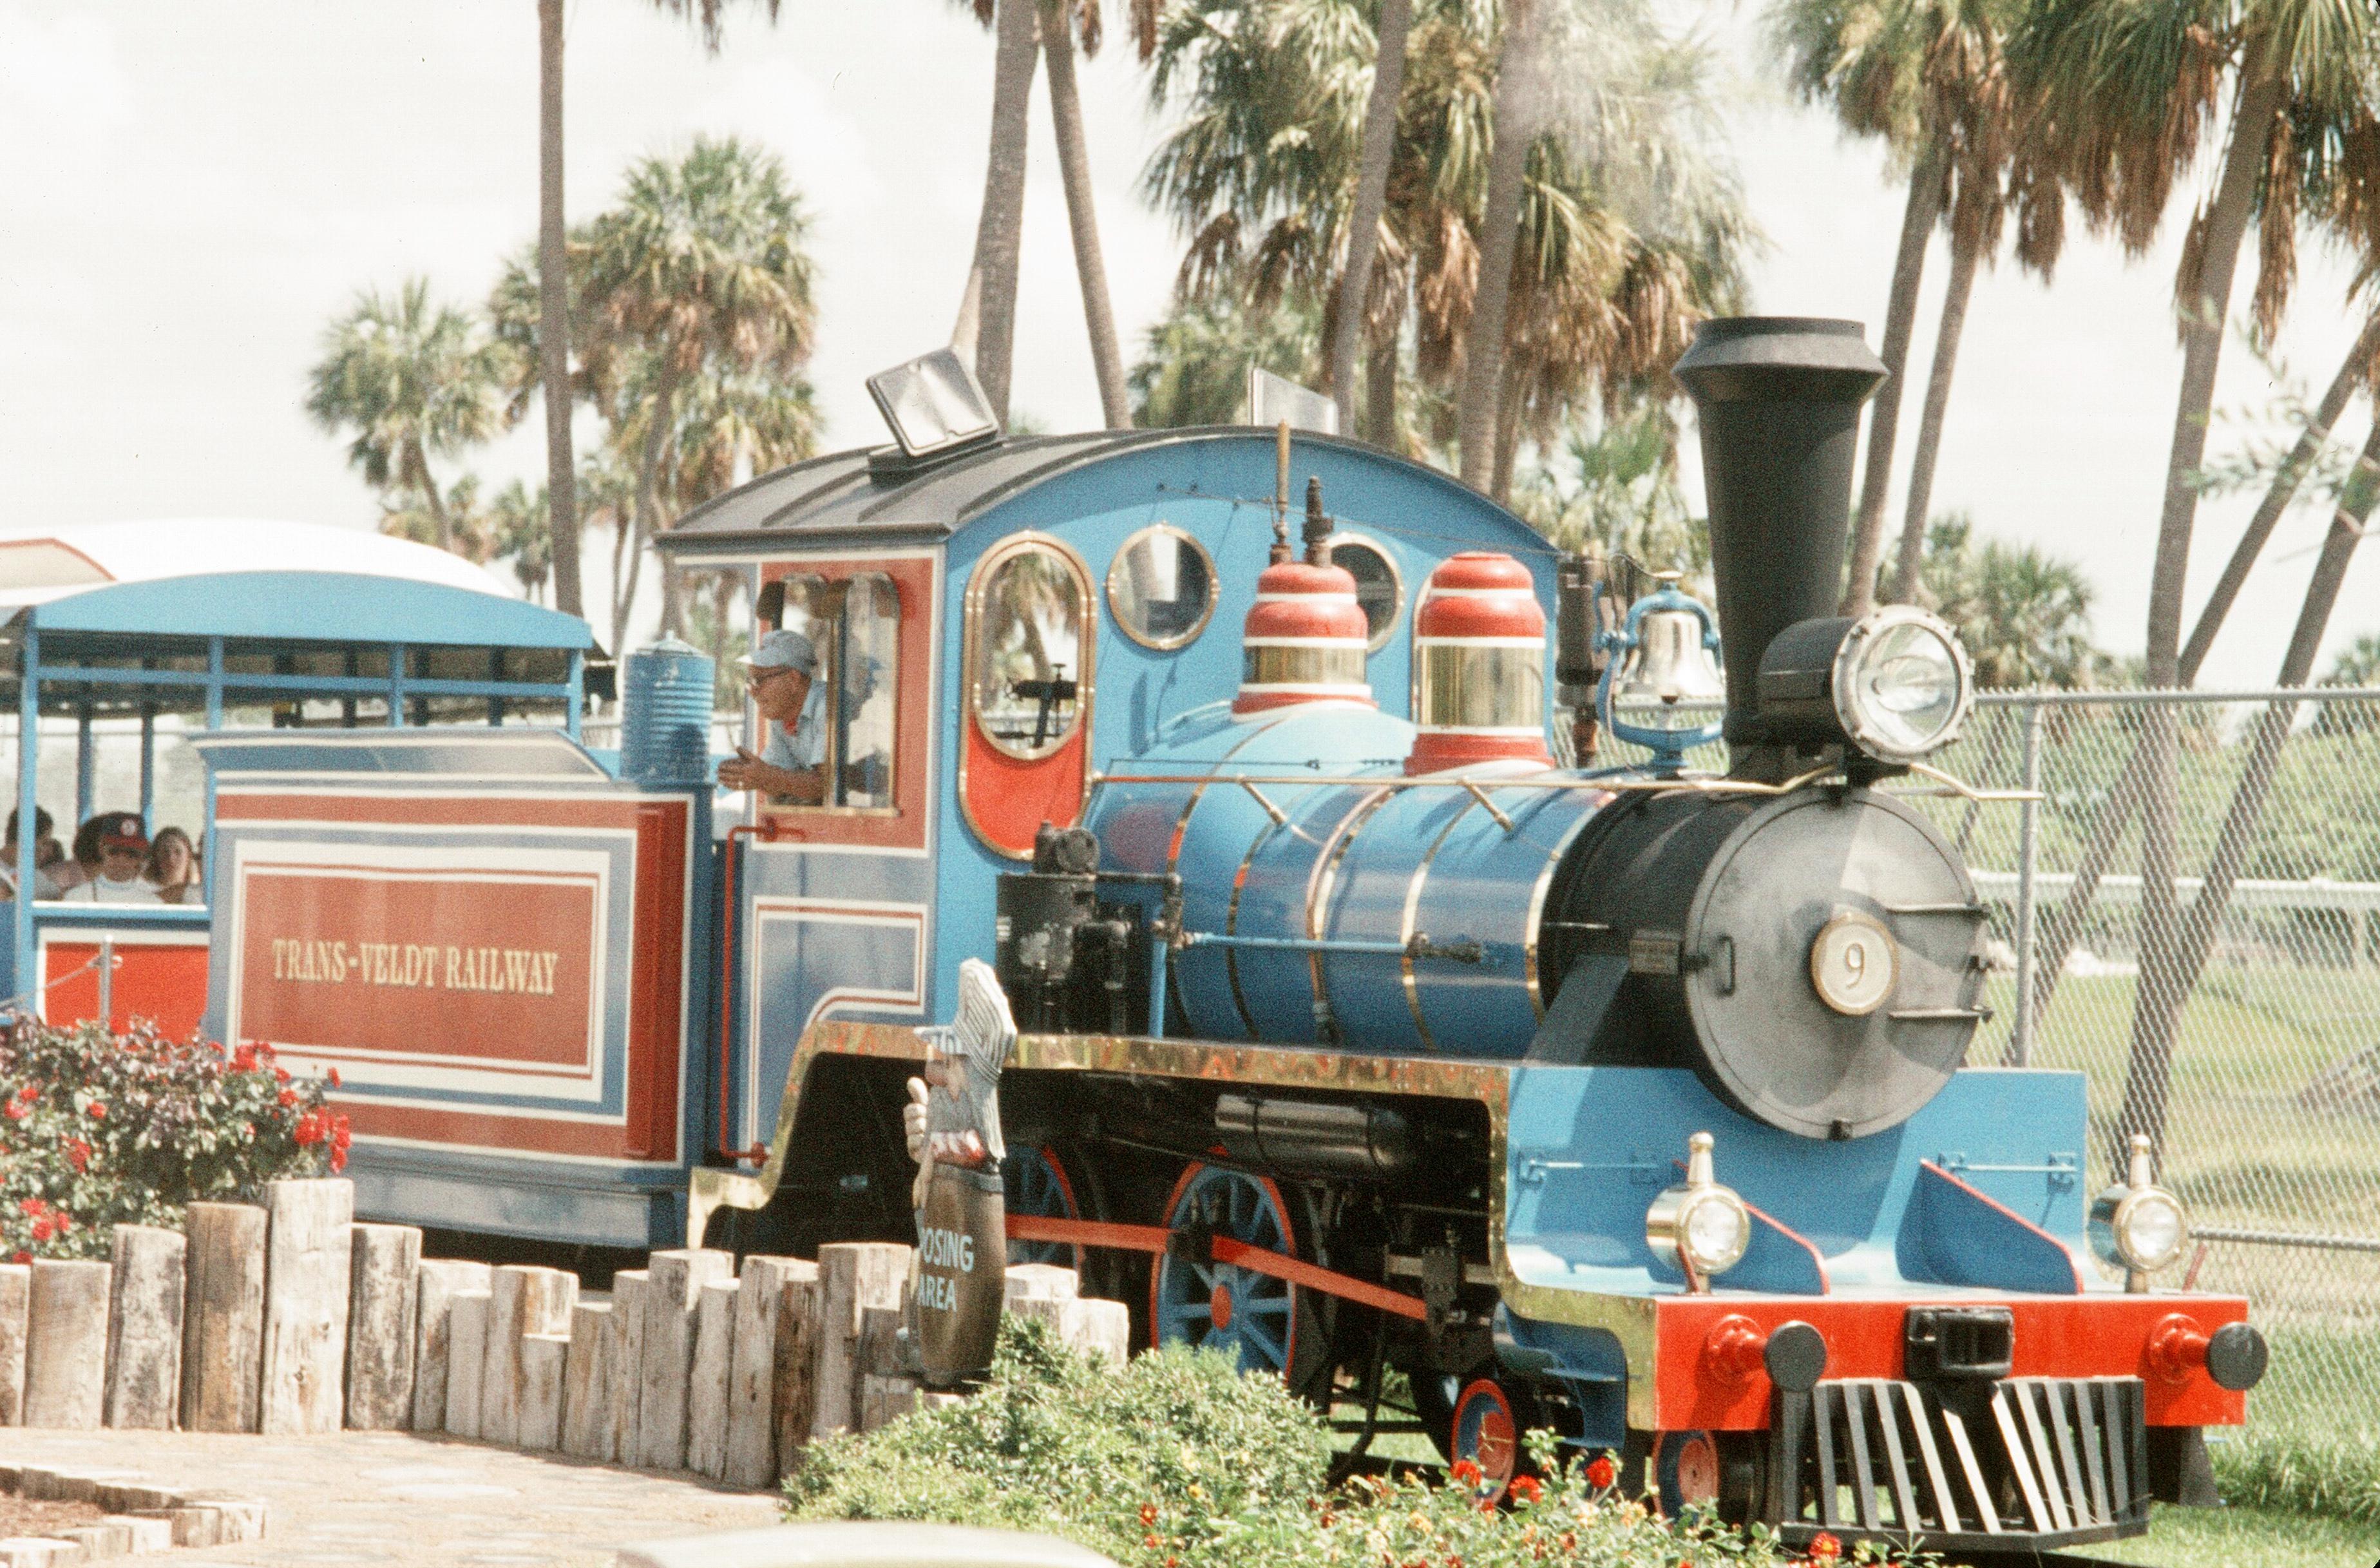 Miniature train at Busch Gardens%2C Tampa%2C Florida%2C 1972 %281 of 2%29 - Transportation From Seaworld To Busch Gardens